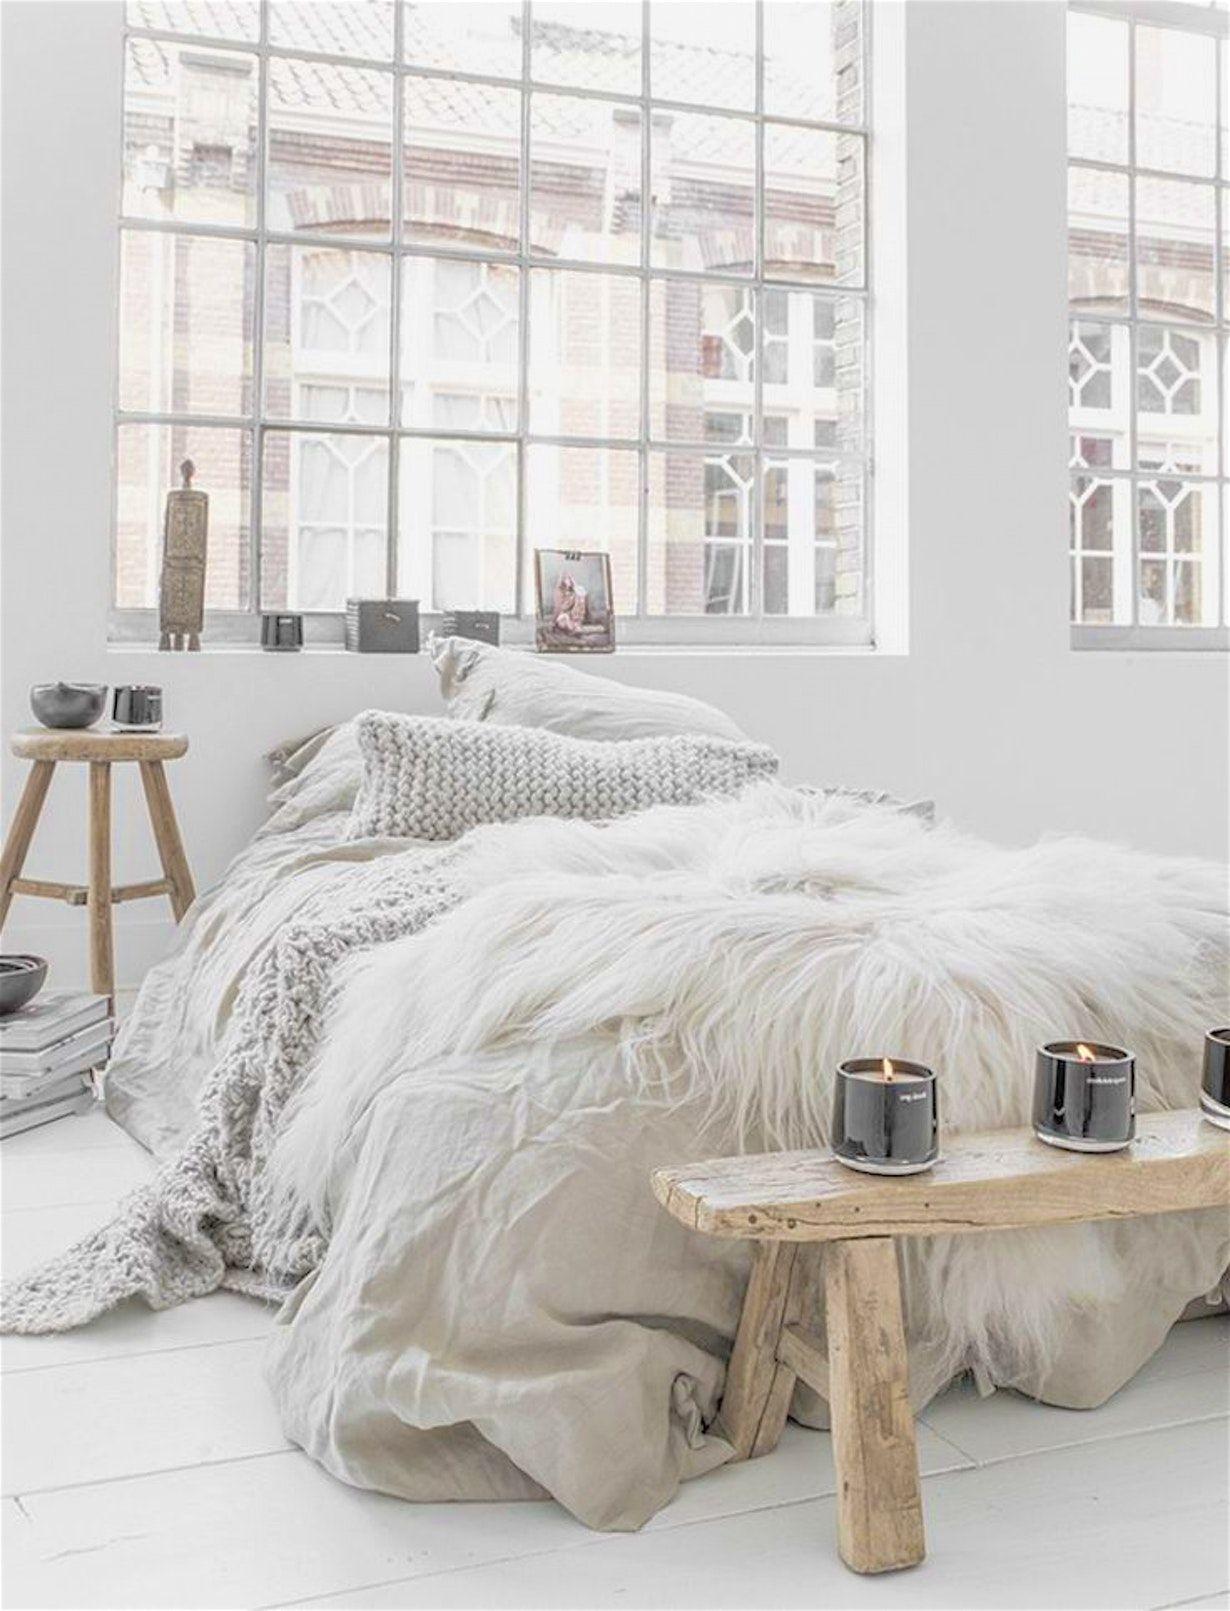 Cozy Bedroom Ideas Sets And Designs Delux Cozy Bedroom Ideas Sets And Designs Admirable Appearance Remodel Bedroom Guest Bedroom Remodel Master Bedroom Remodel